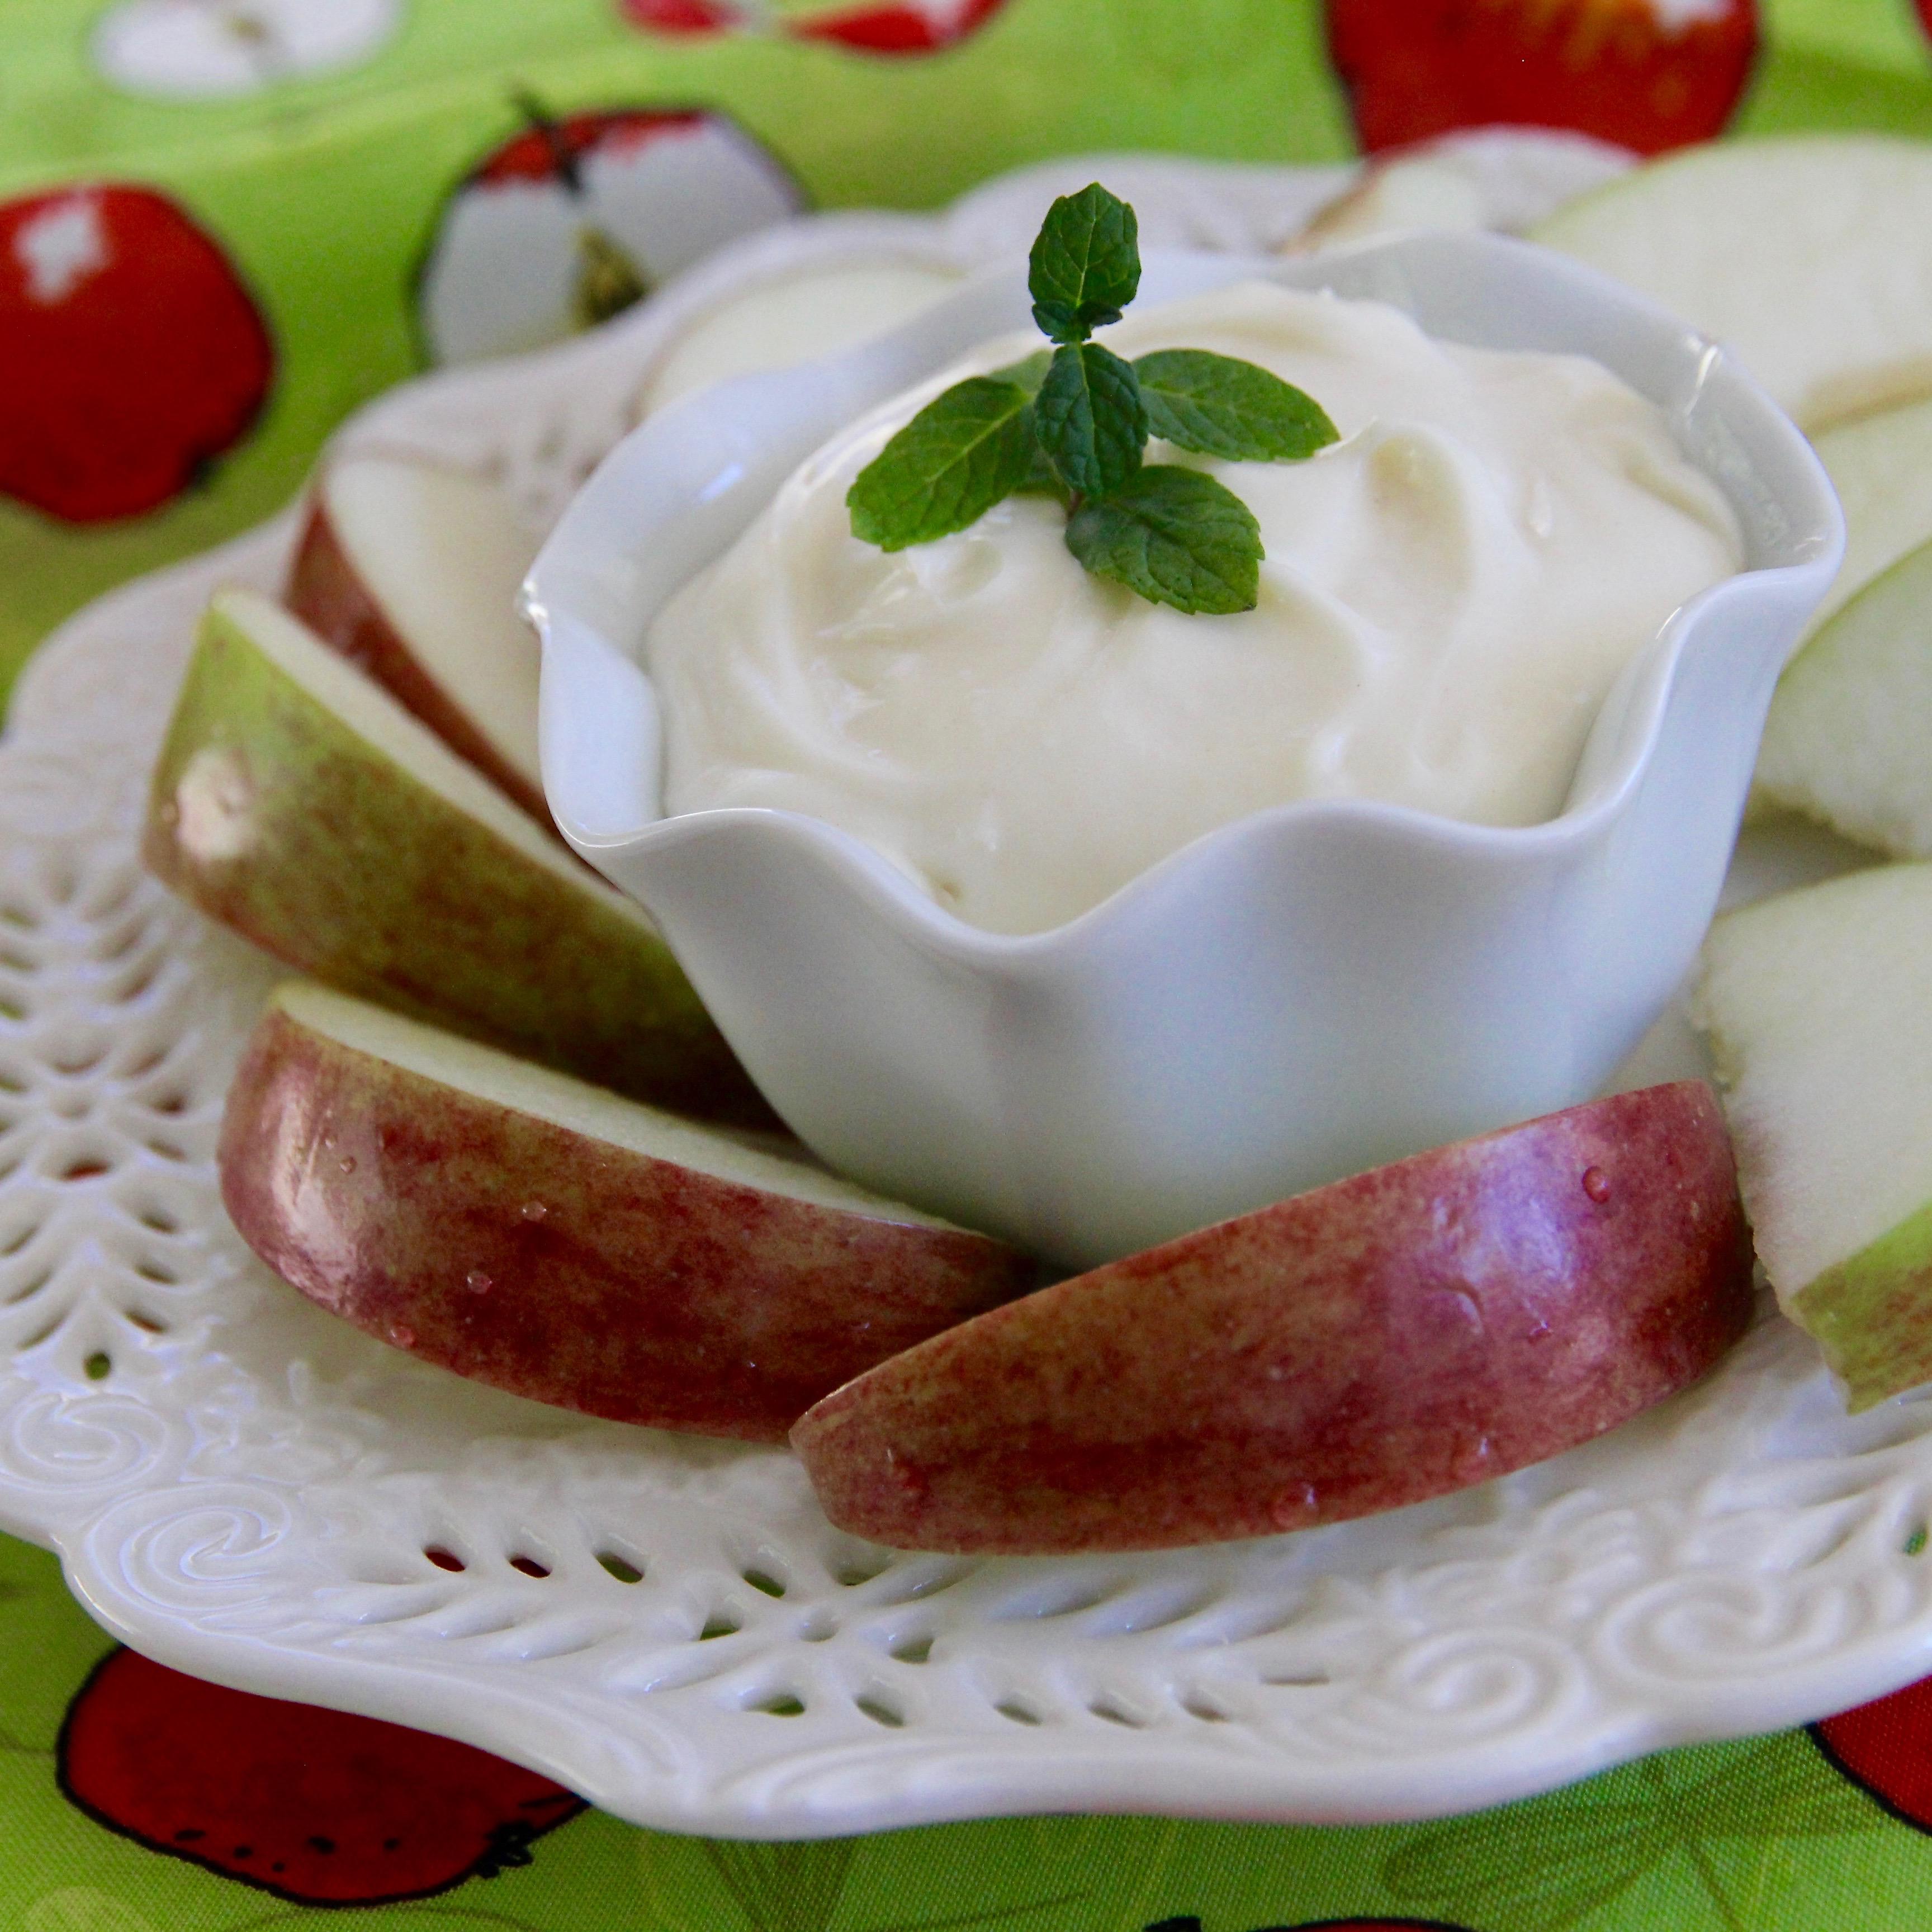 Marshmallow-Peanut Butter-Banana Dip